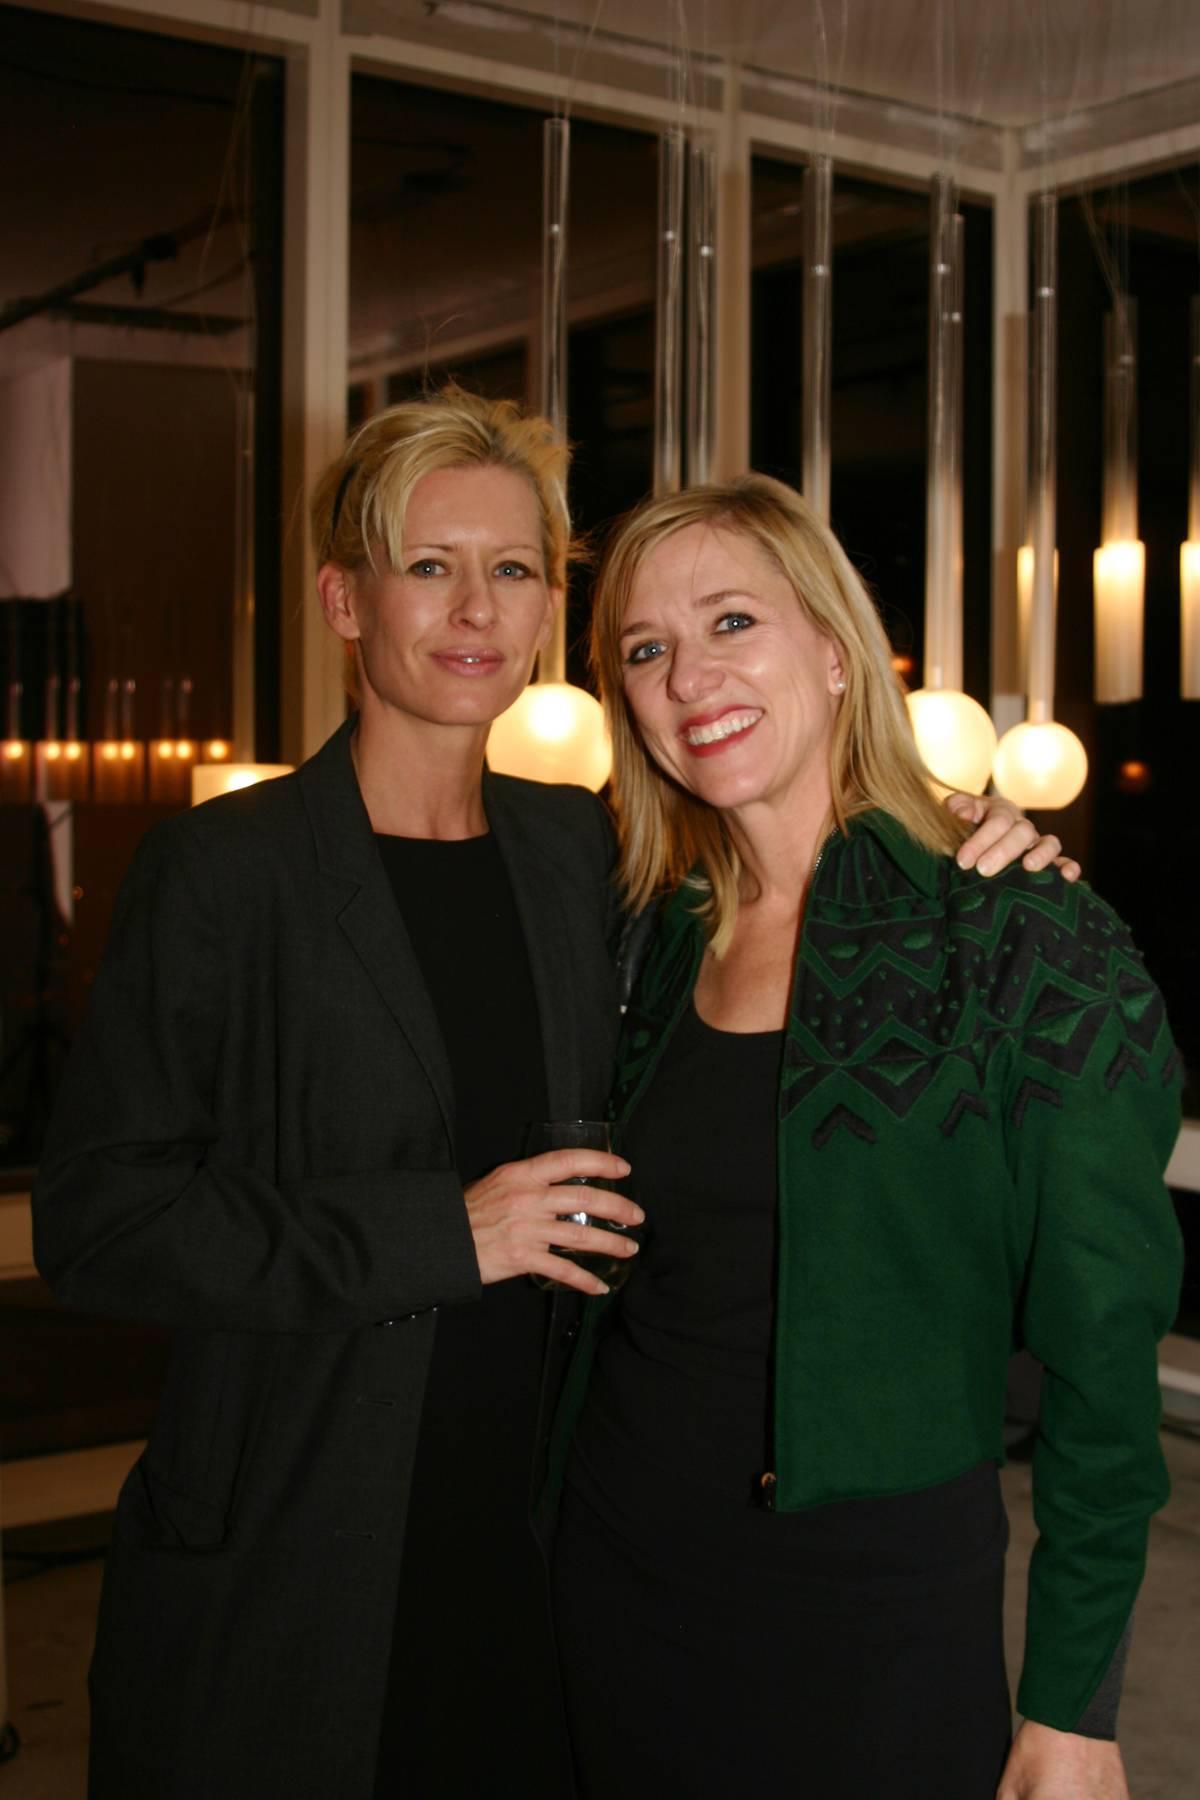 Designer Larissa Sand and Dwell Founder Lara Deam